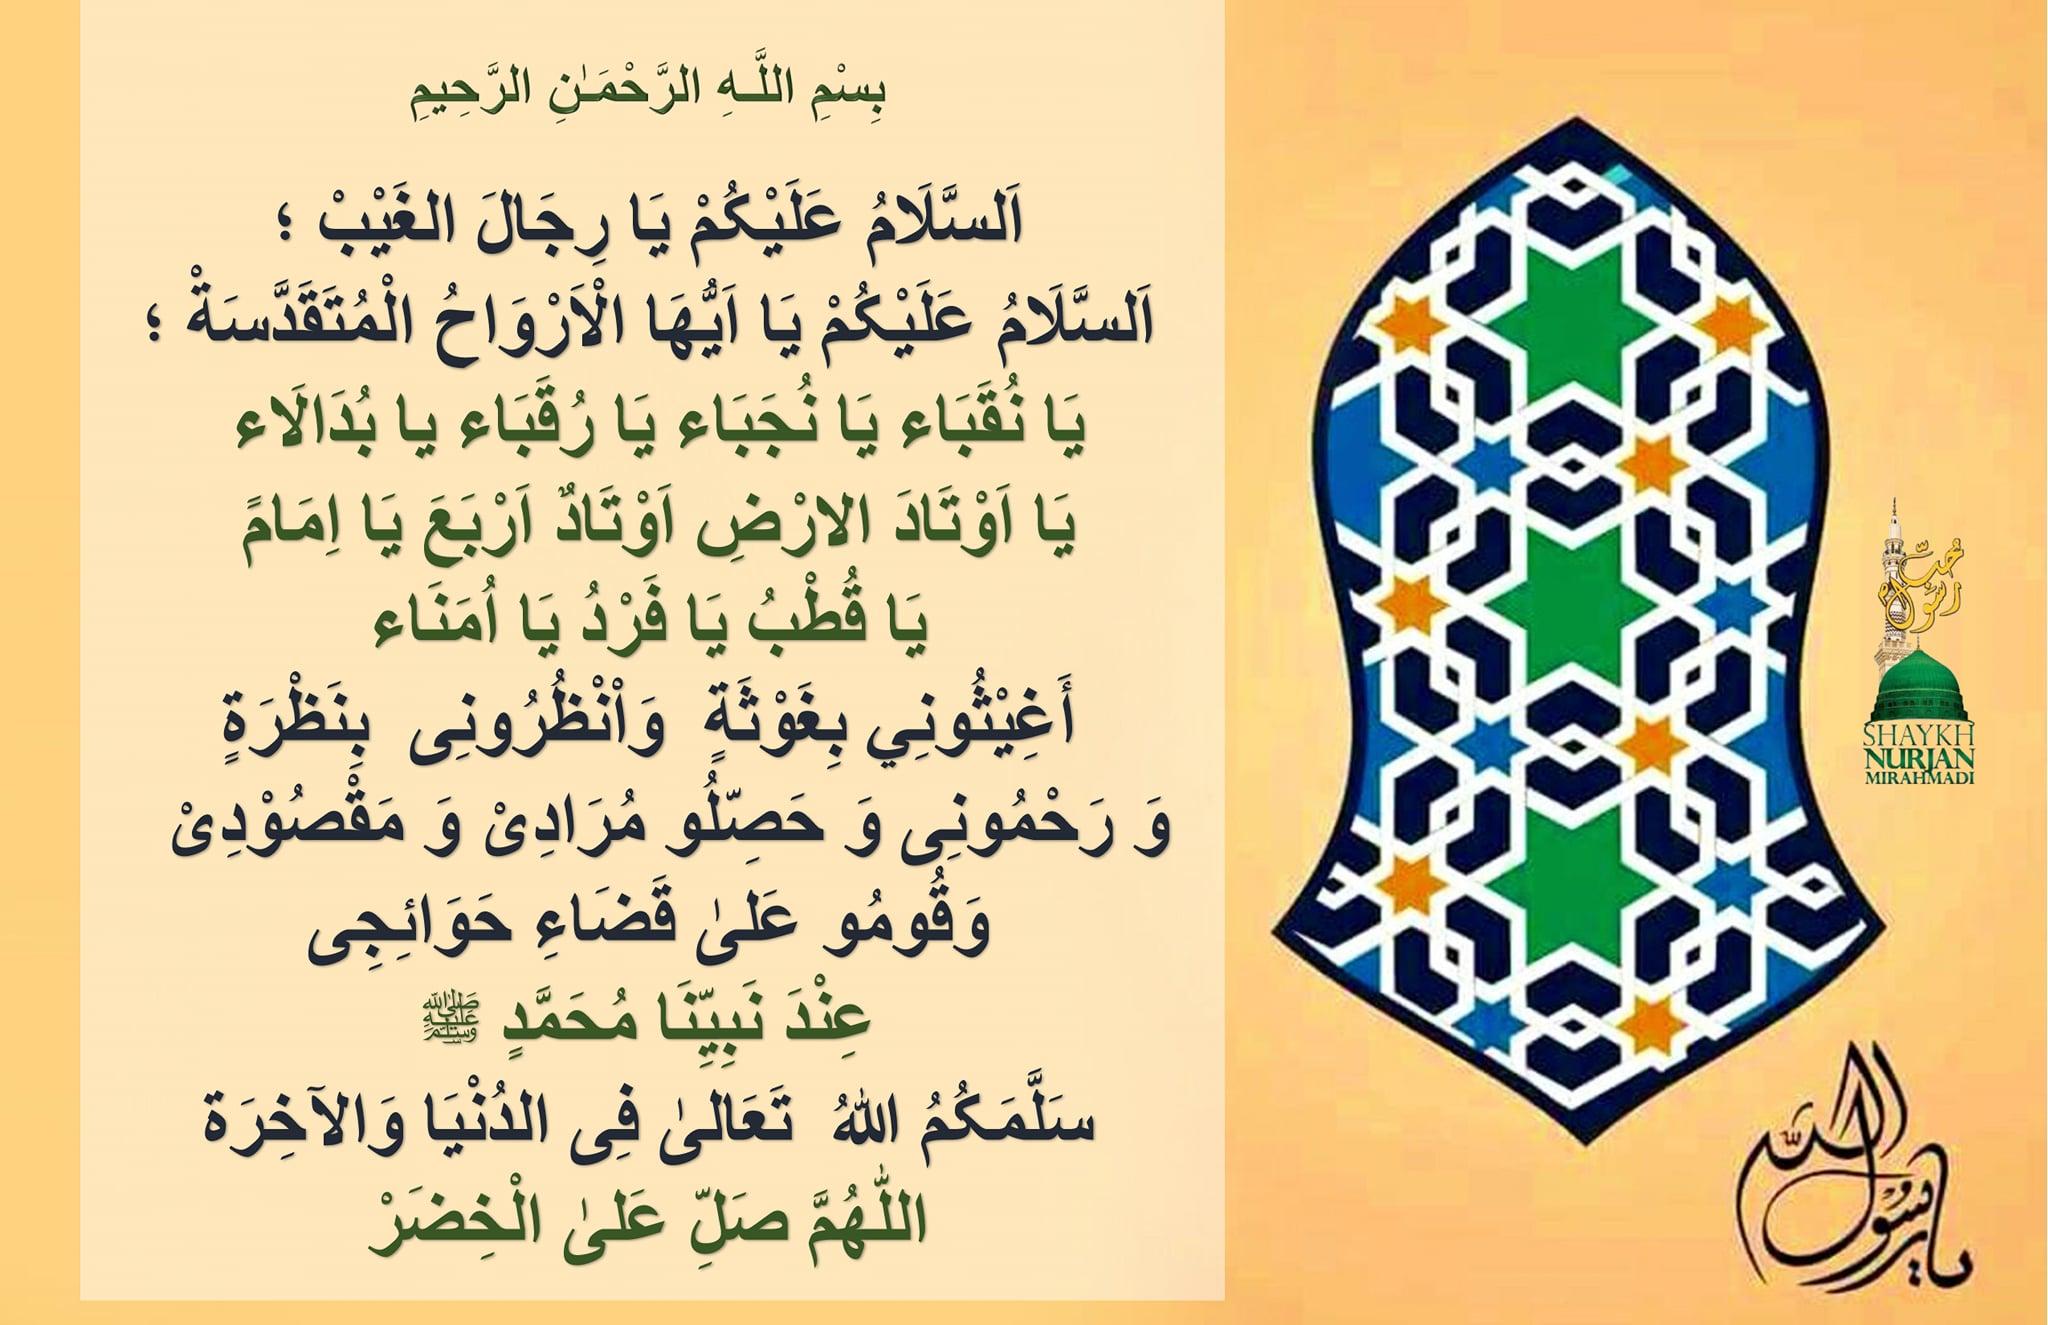 Call Upon Rijal Allah  رجال اللہ سے مدد کی درخواست کیجئے  بِسْمِ اللَّـهِ الرَّح...